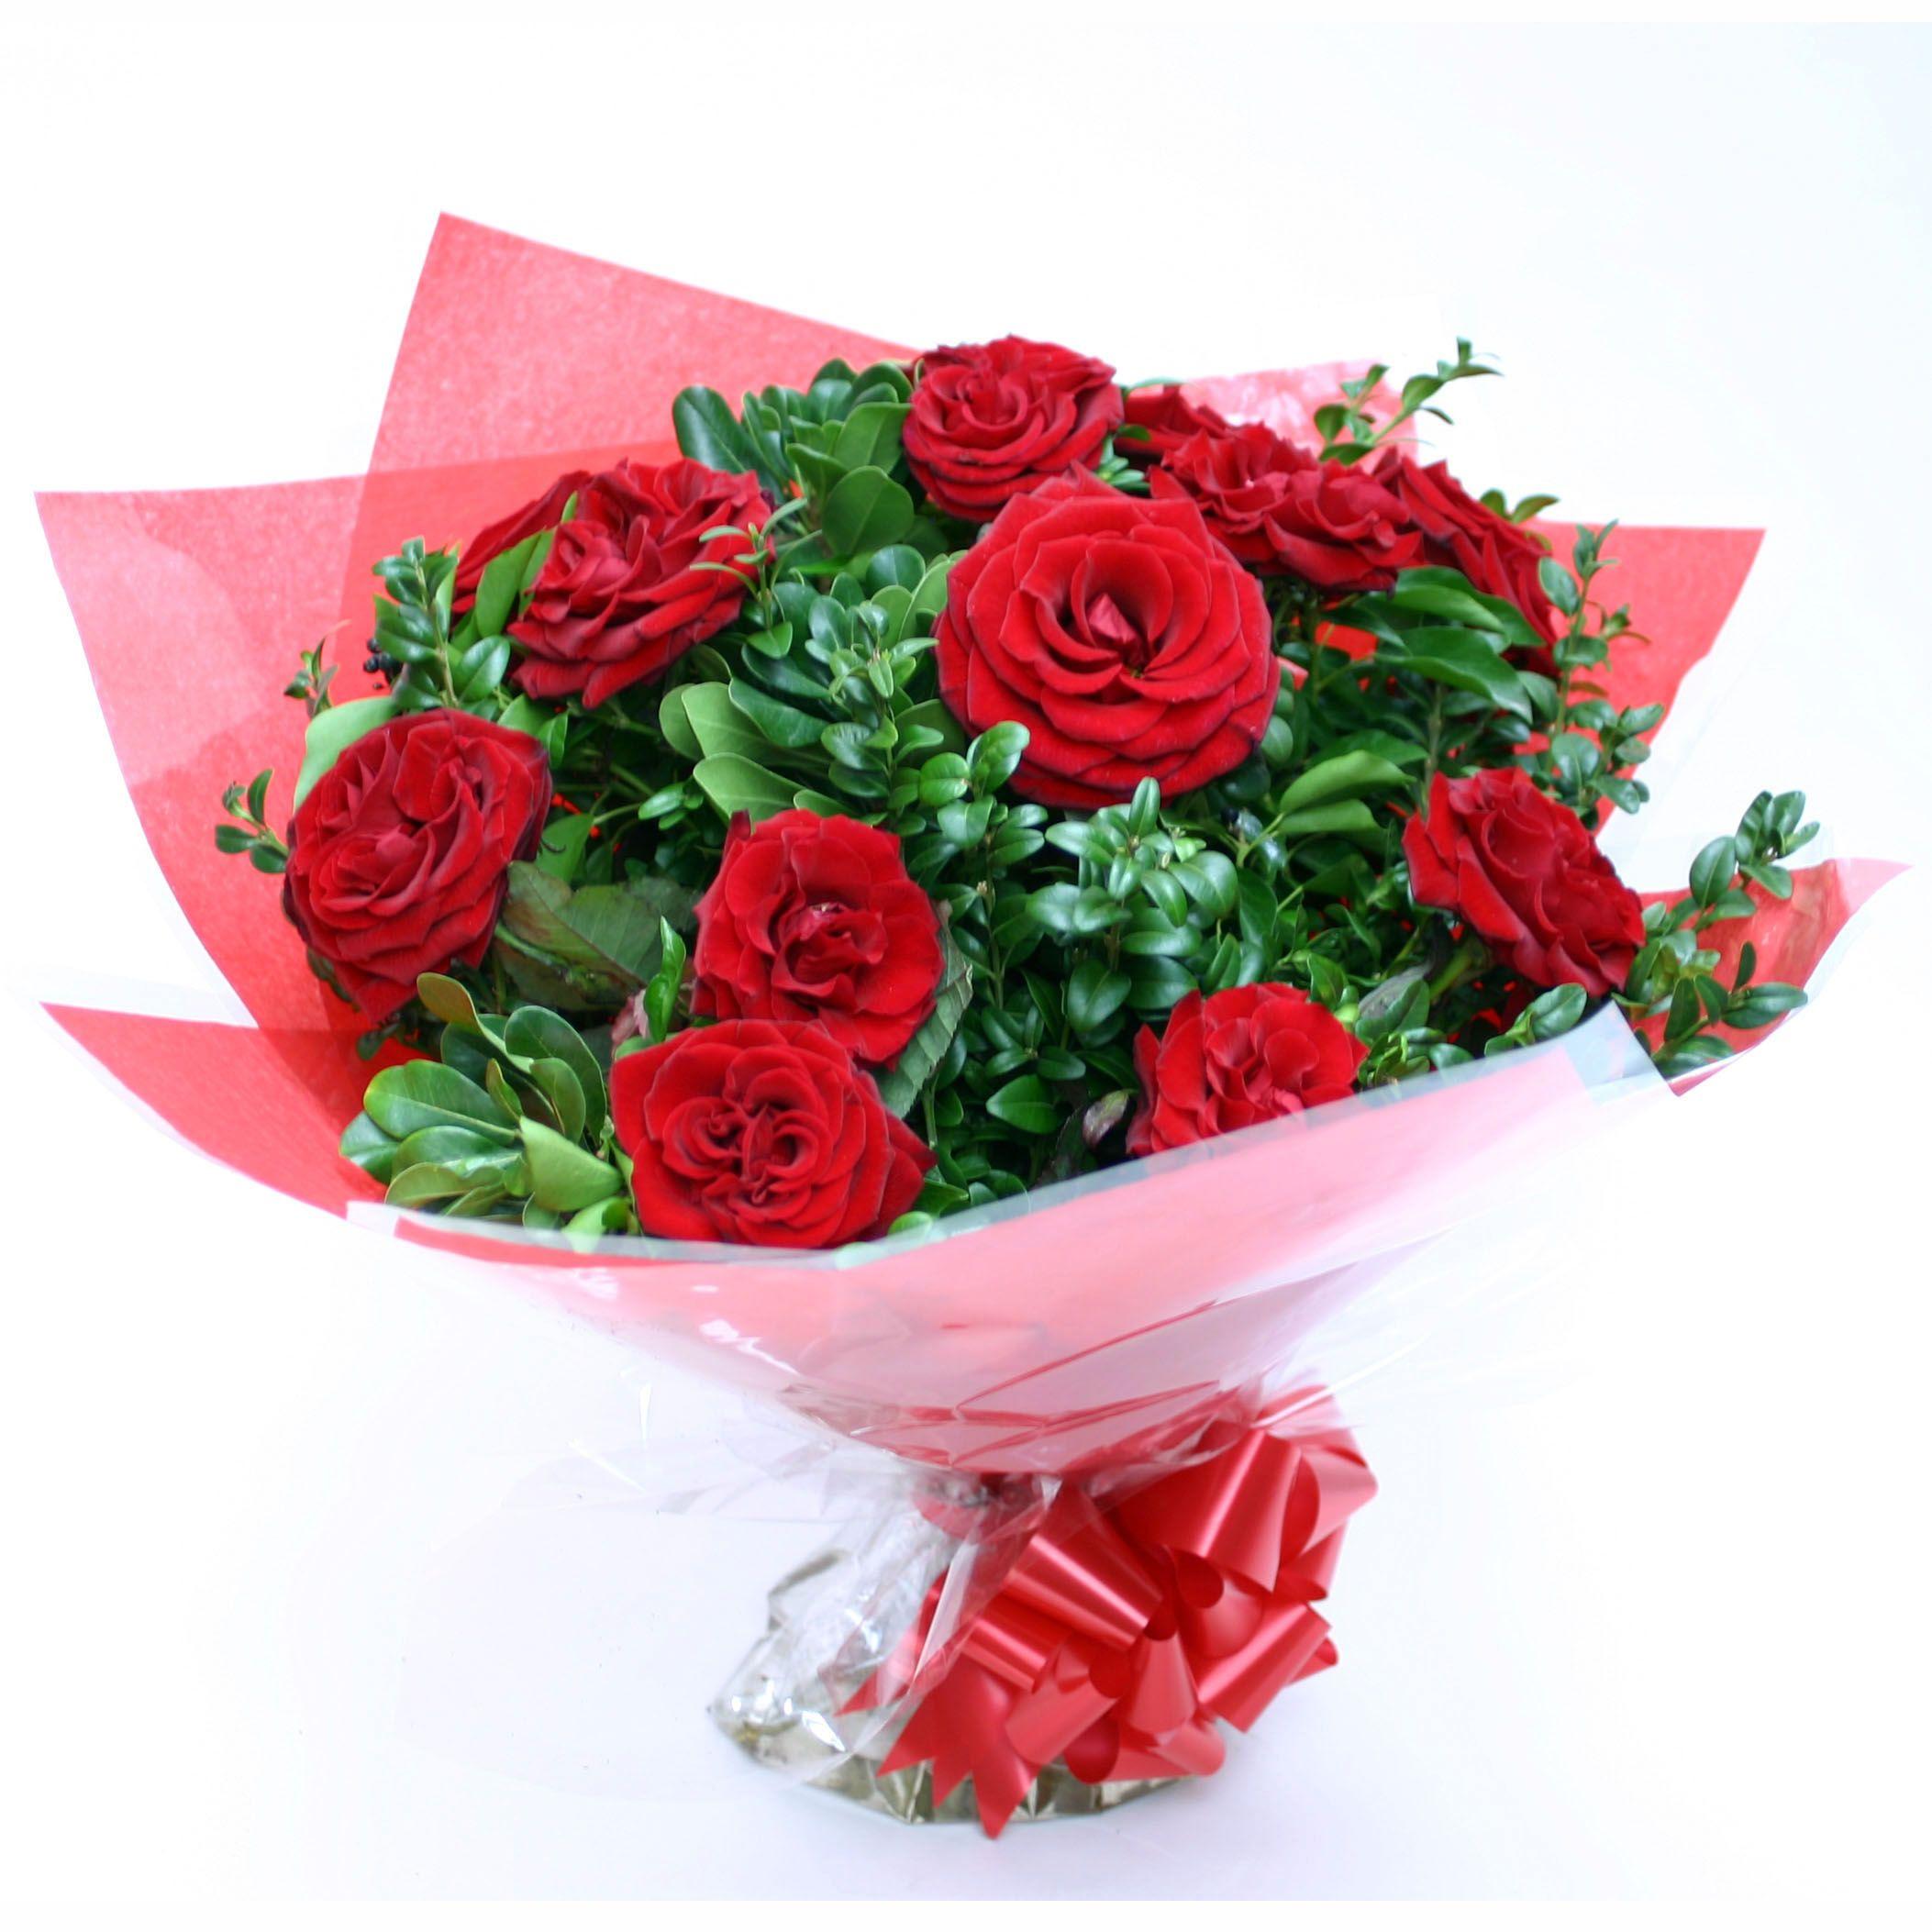 red rose flower arrangementsBeautifull Pictures Of Flowers